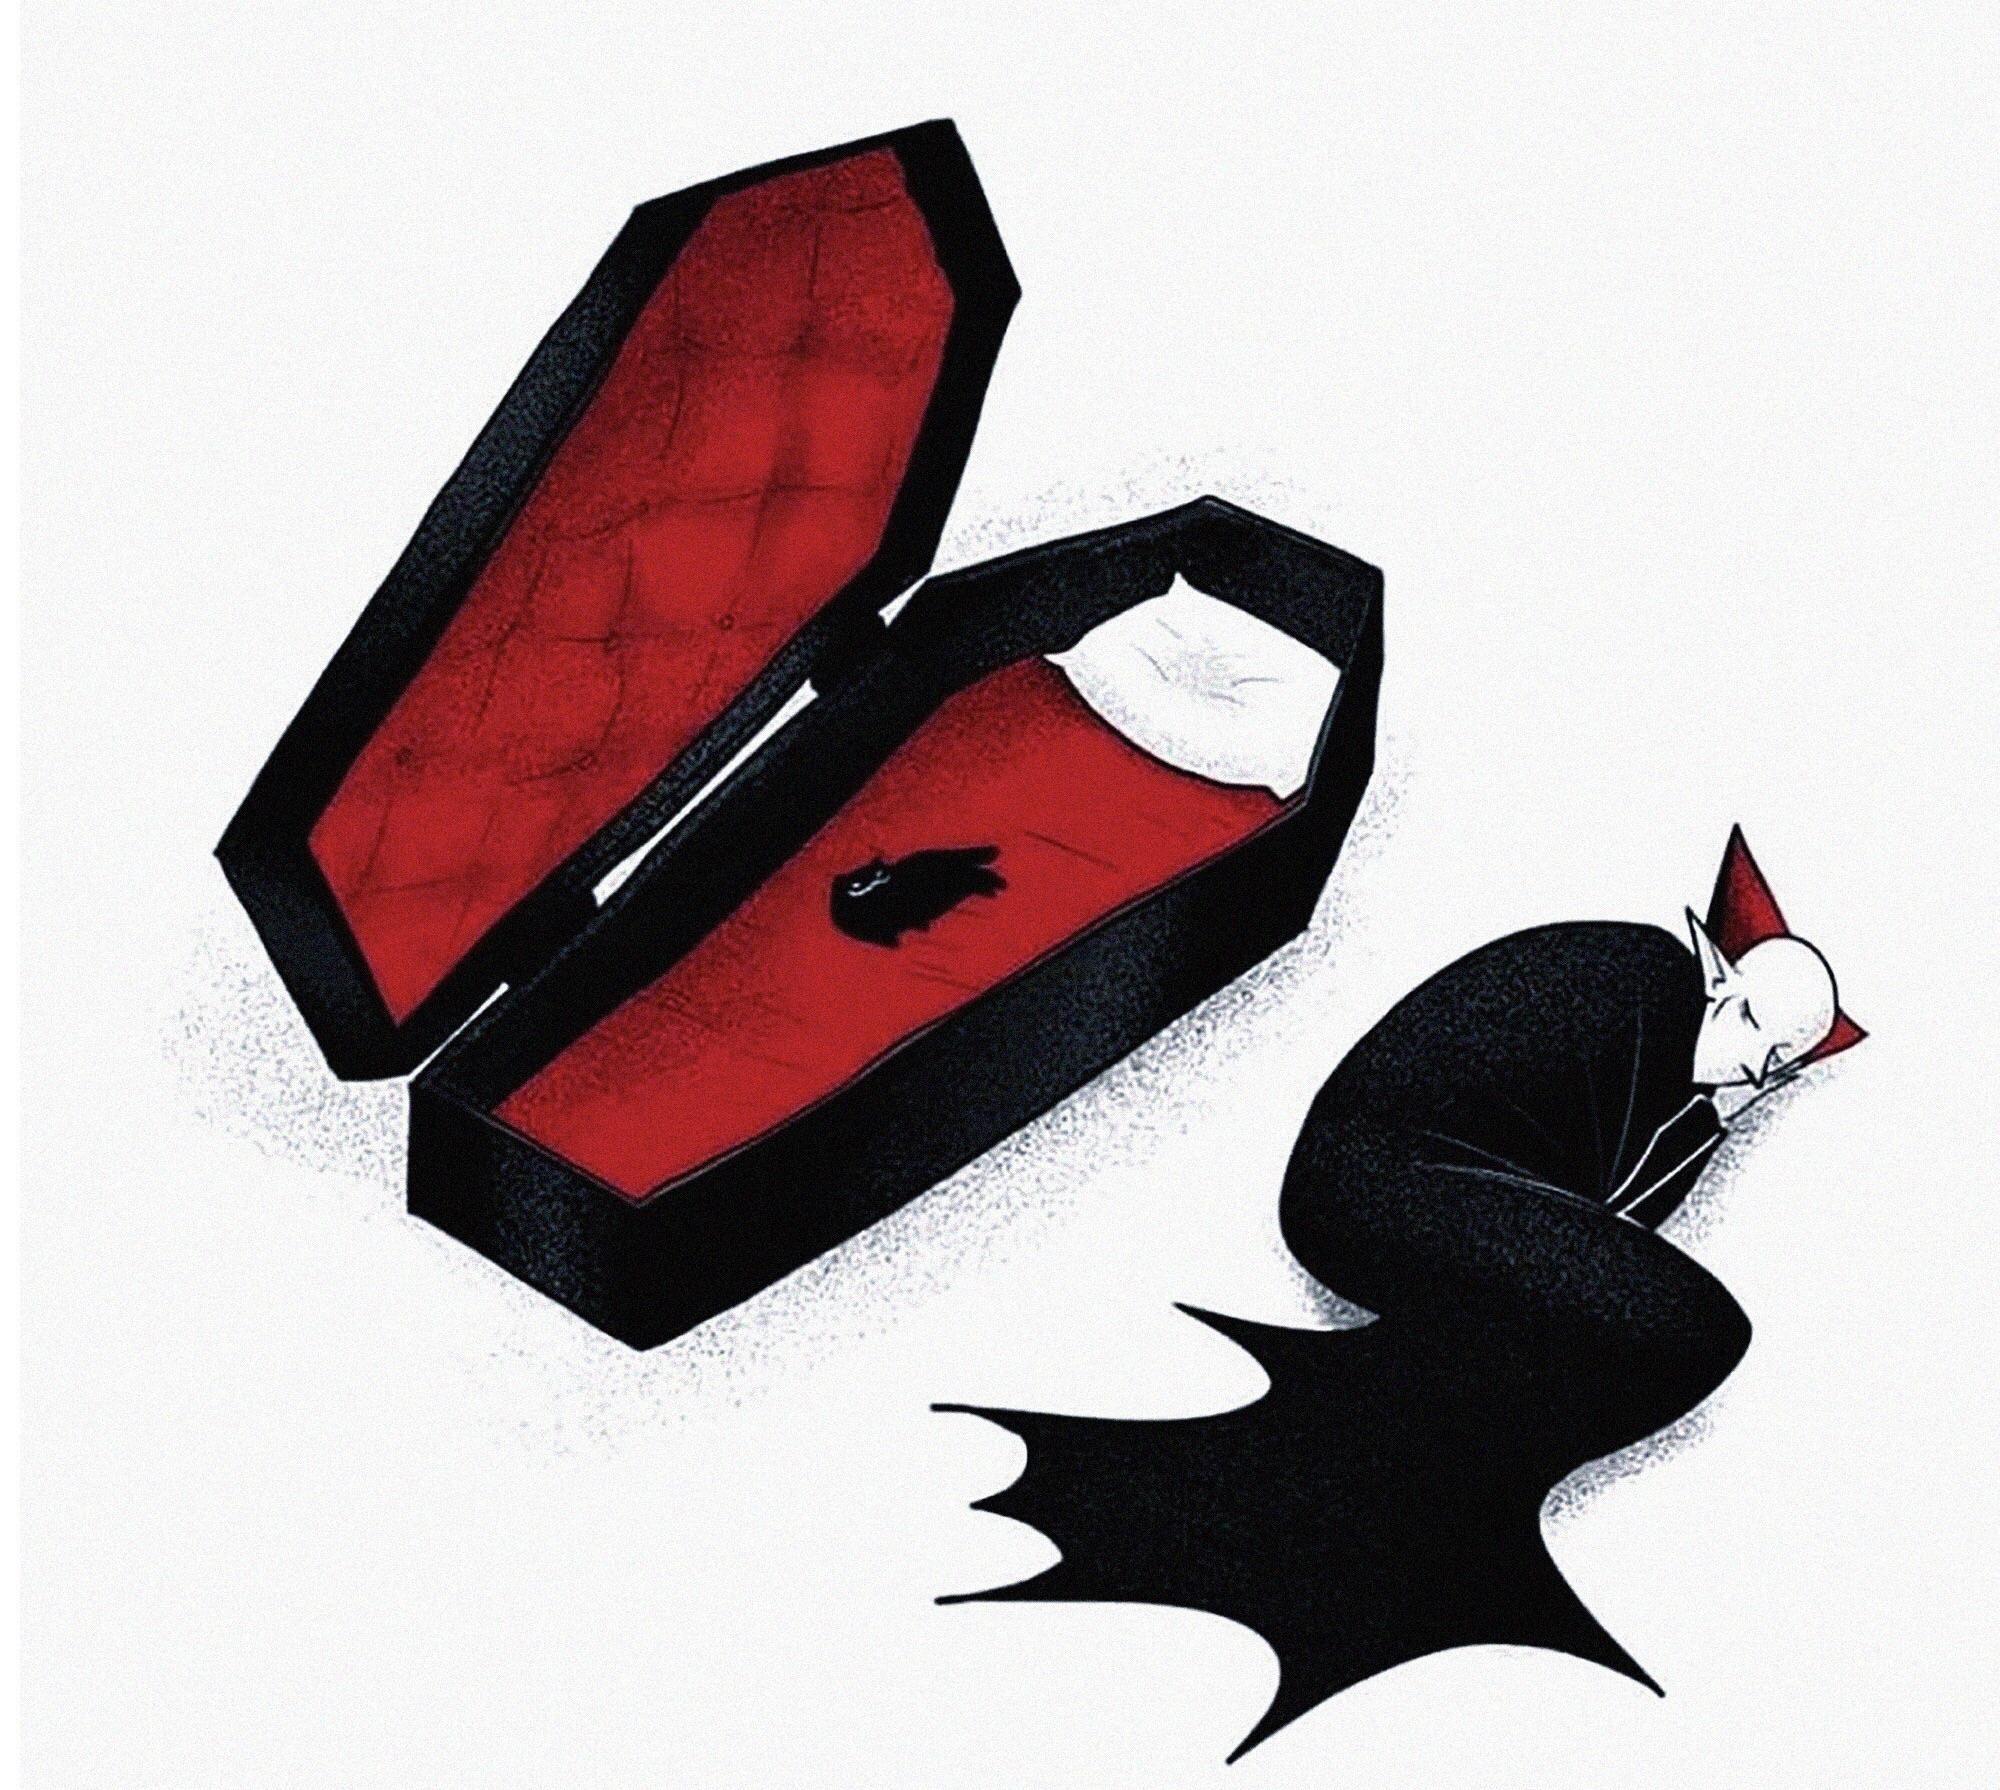 If Dracula has a cat